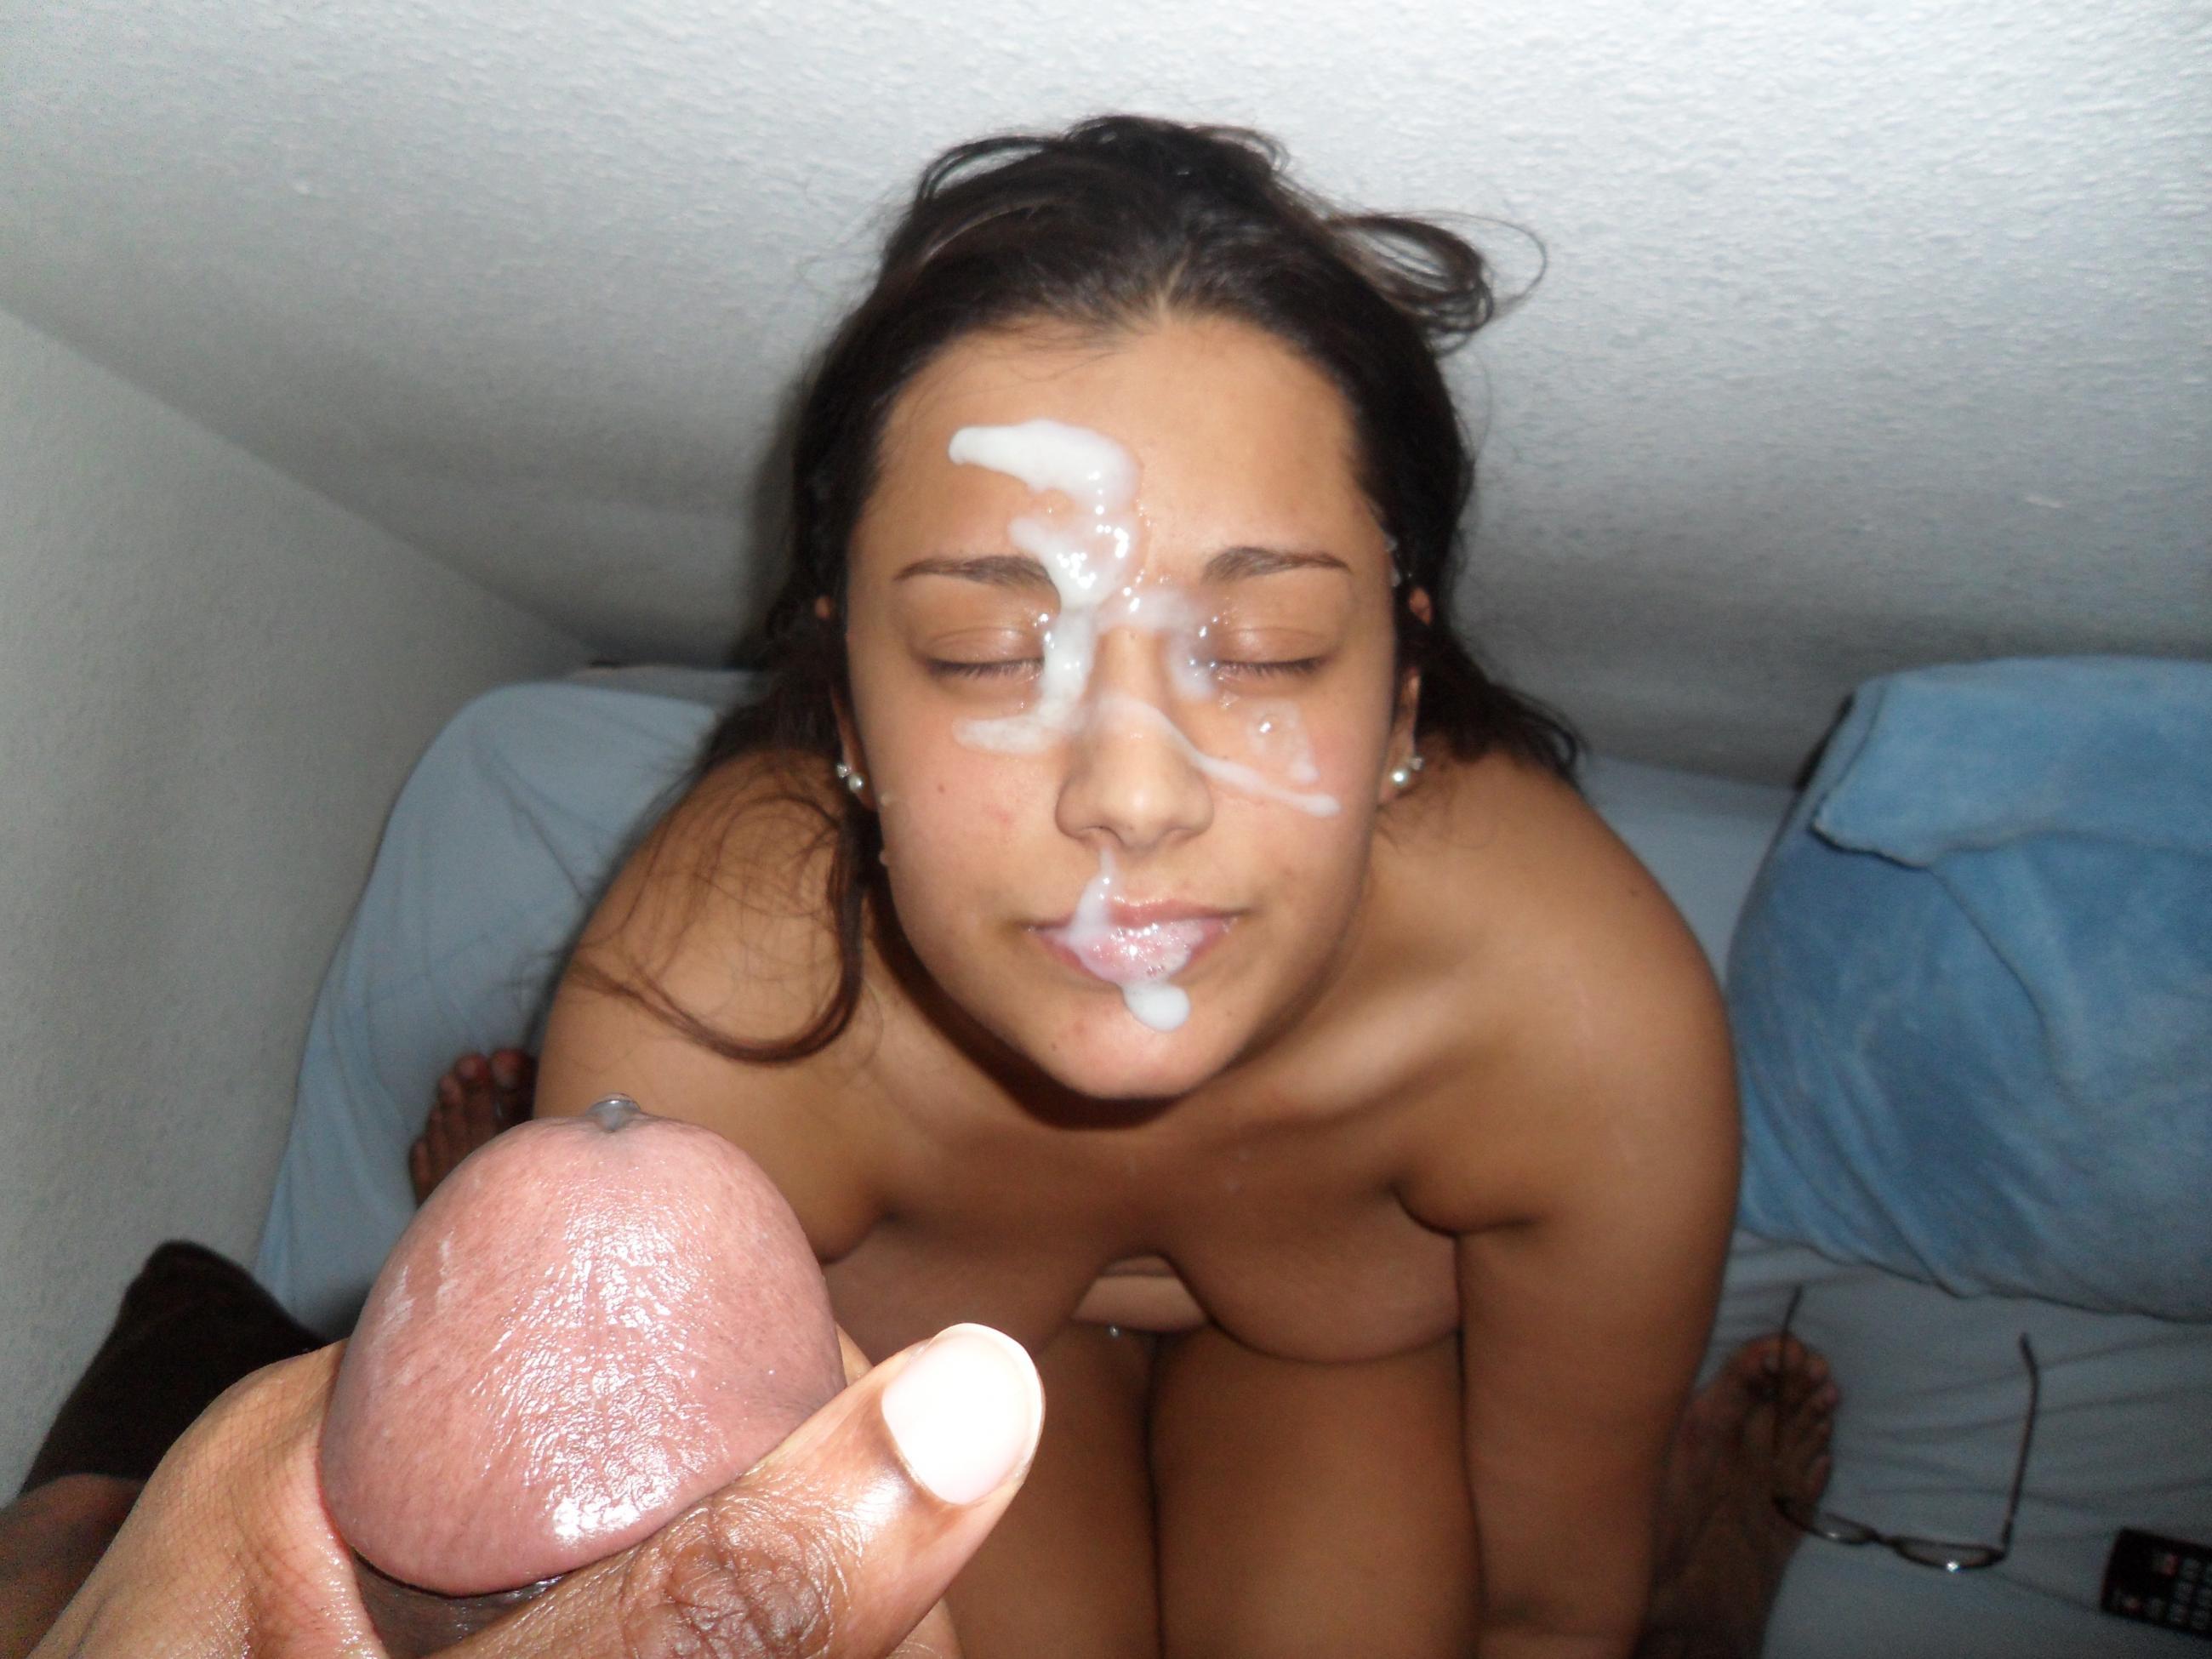 Chloe Carter In Thicker Cum Sex Photo